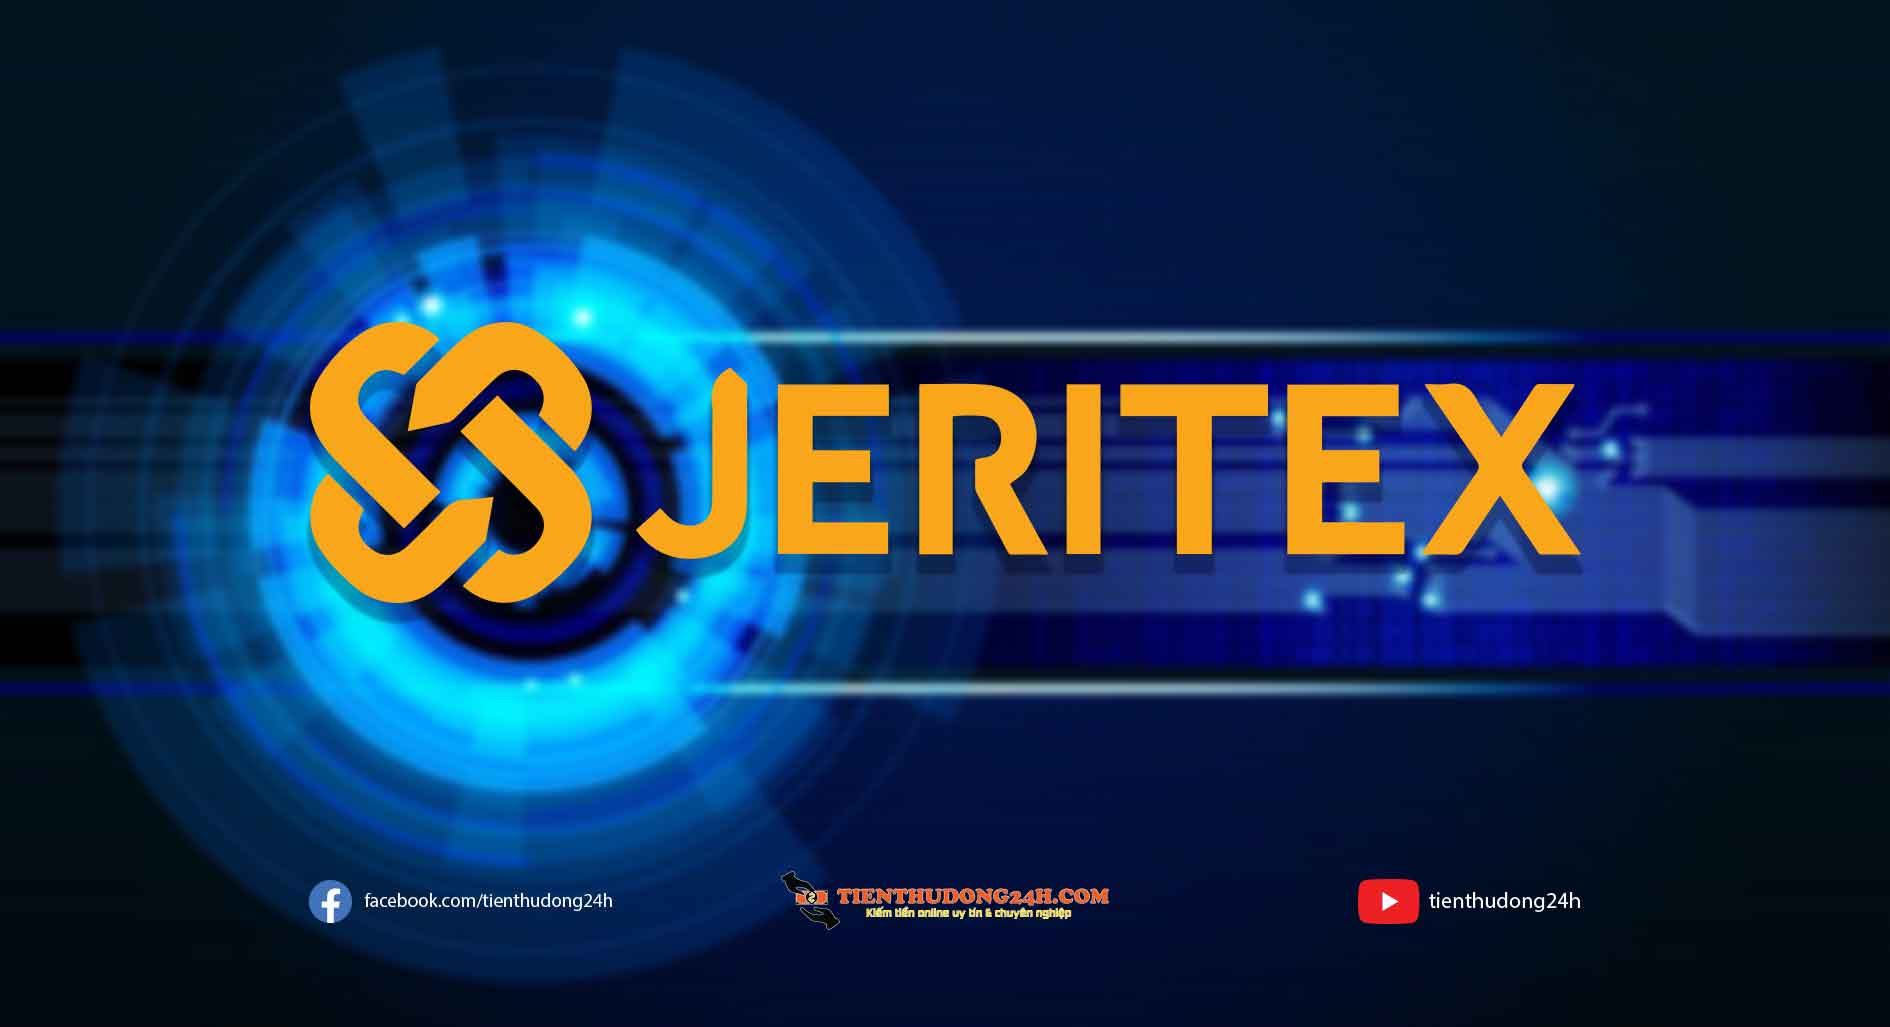 jeritex là gì?